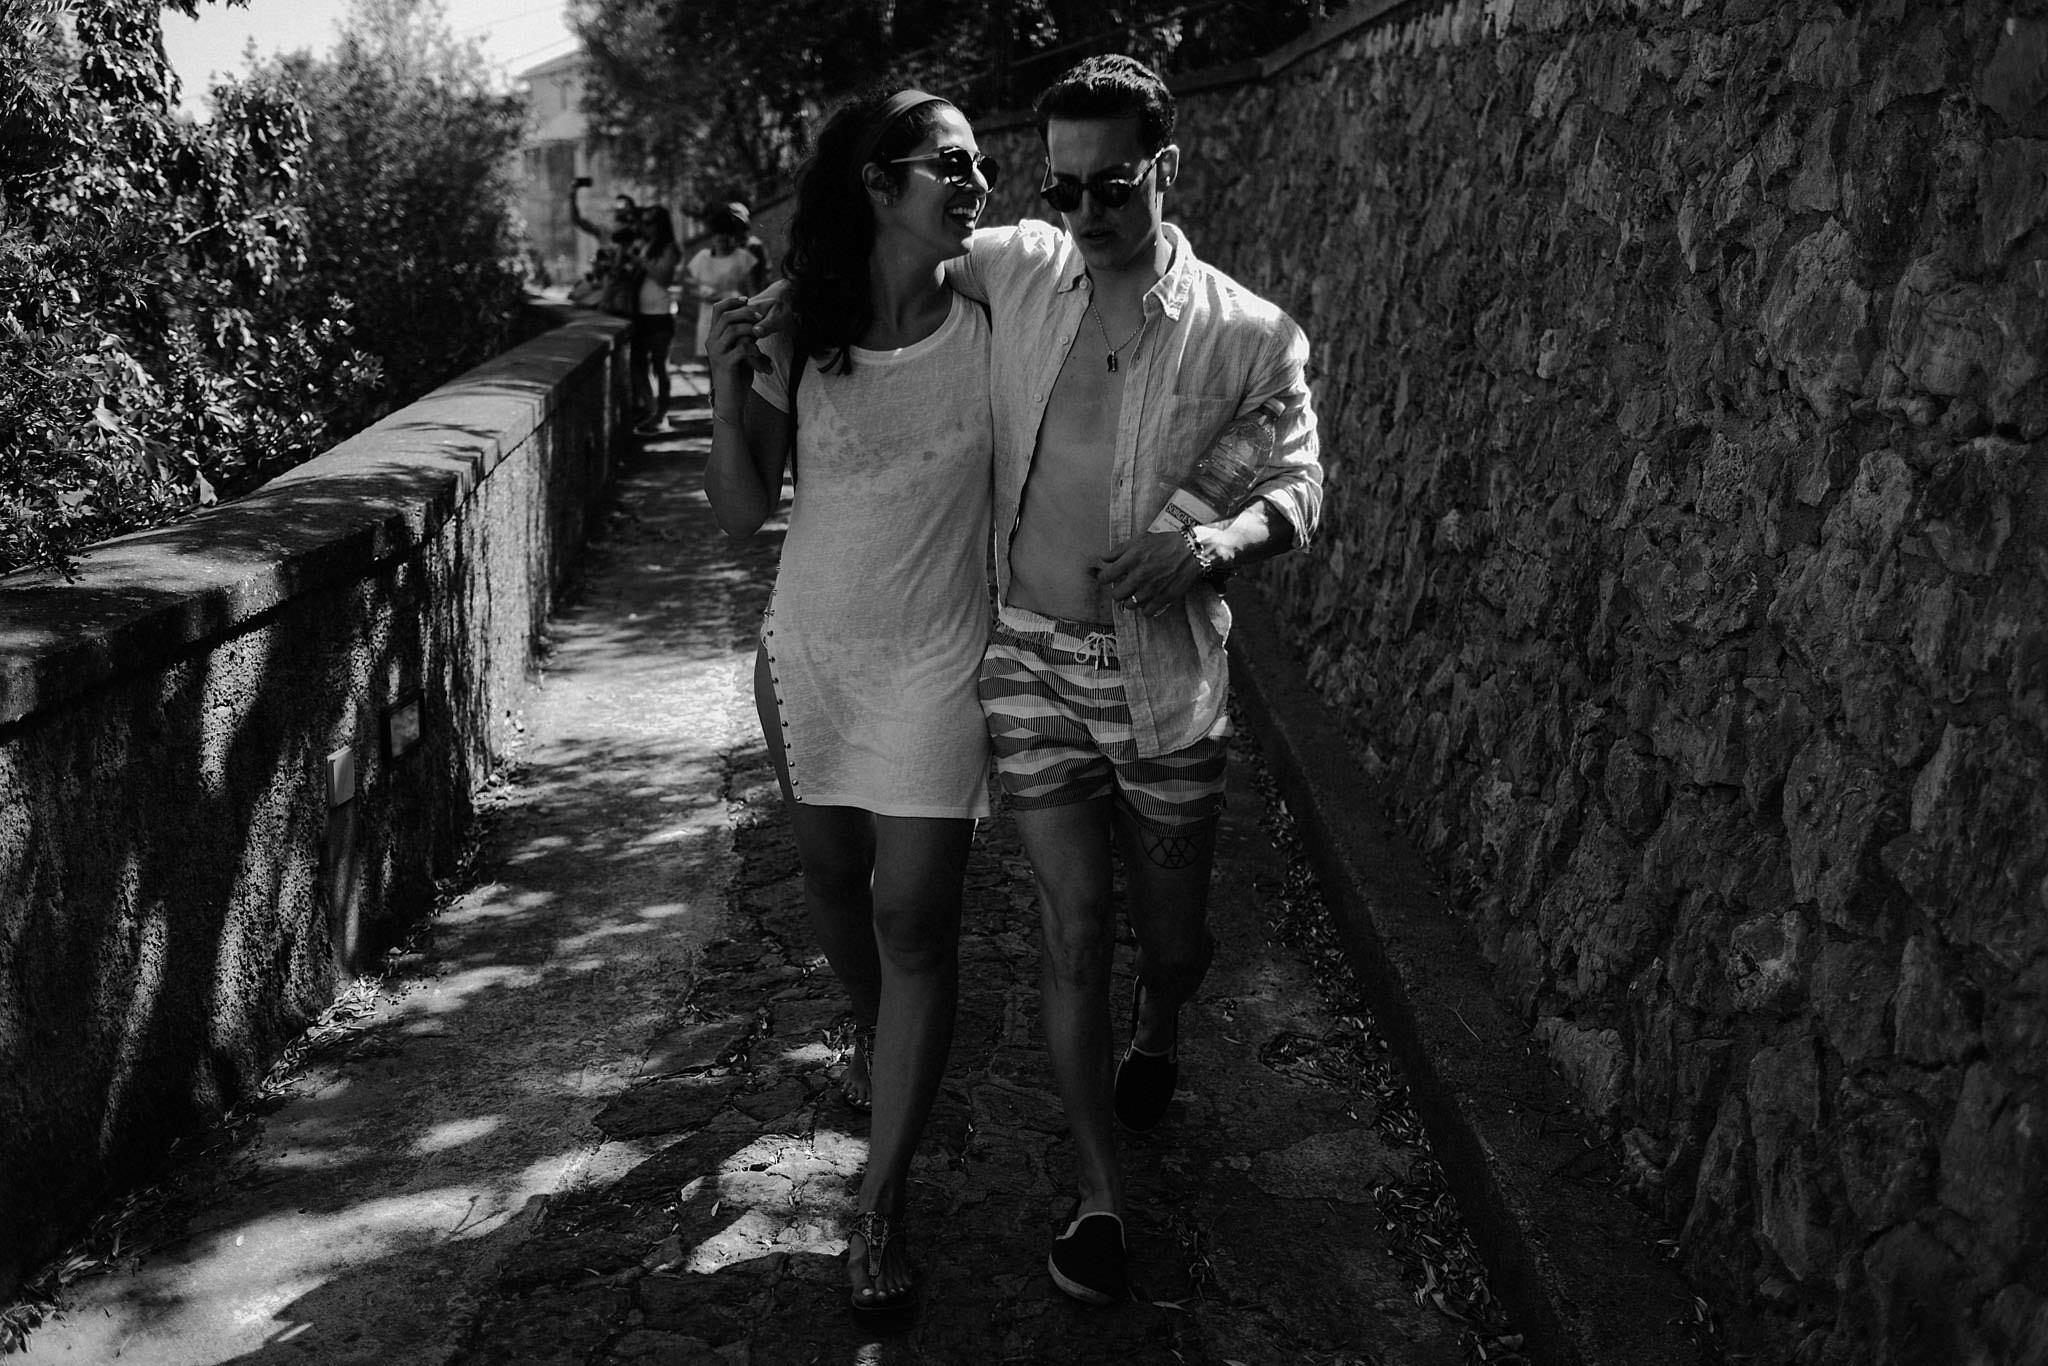 Max-Steph-Italy-Wedding-824.jpg